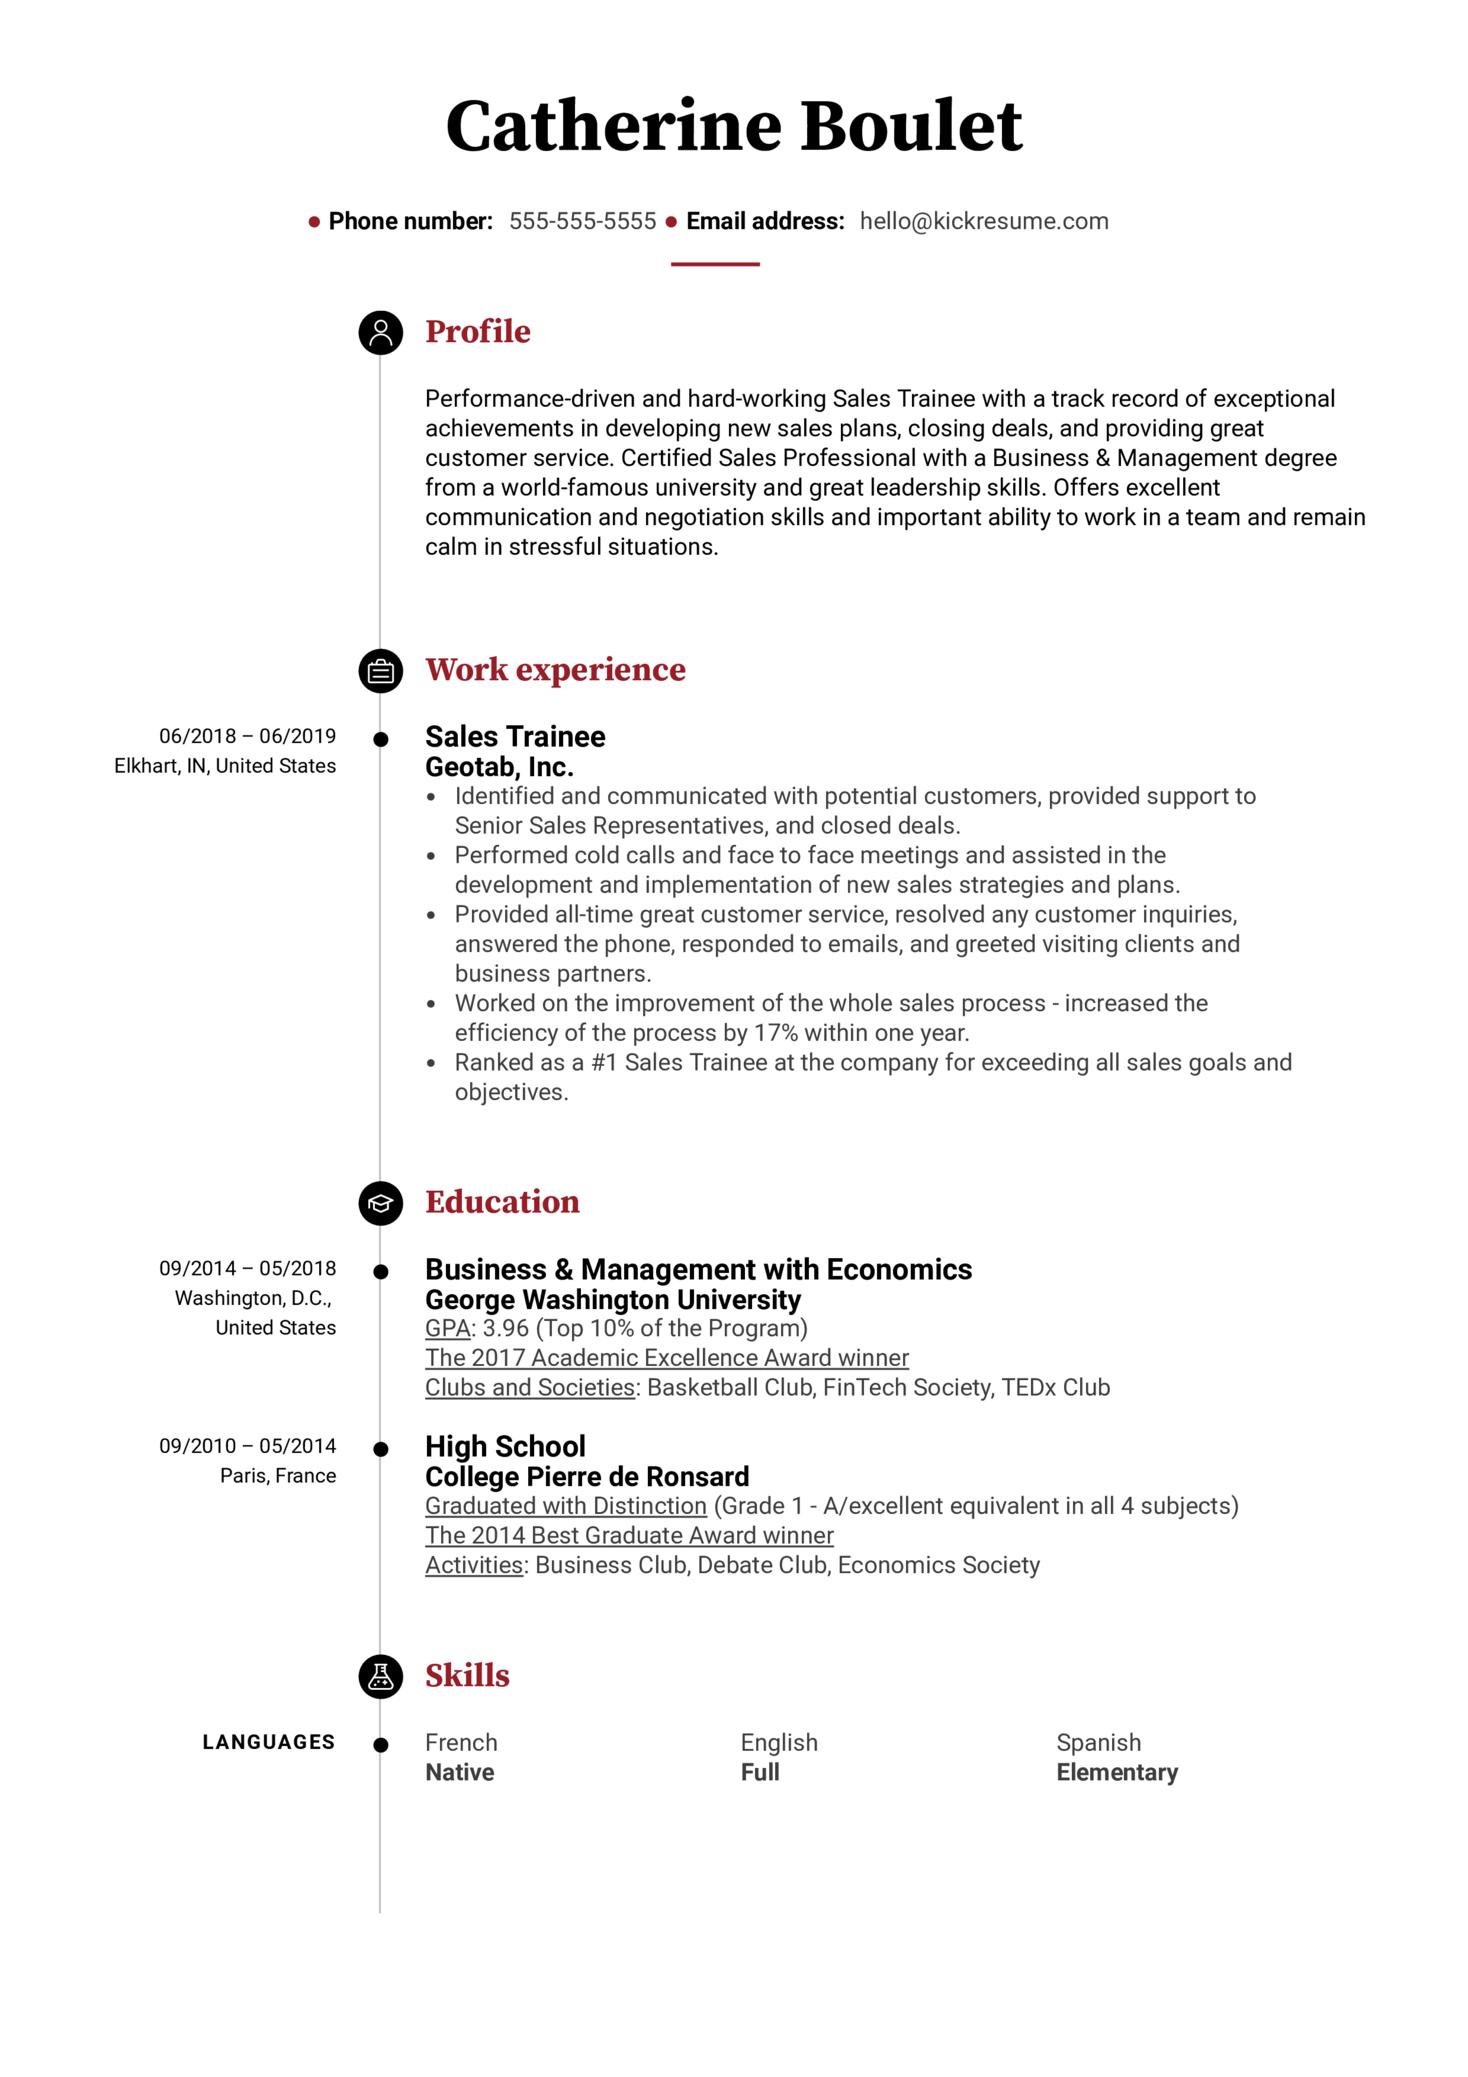 Sales Trainee Resume Example (časť 1)